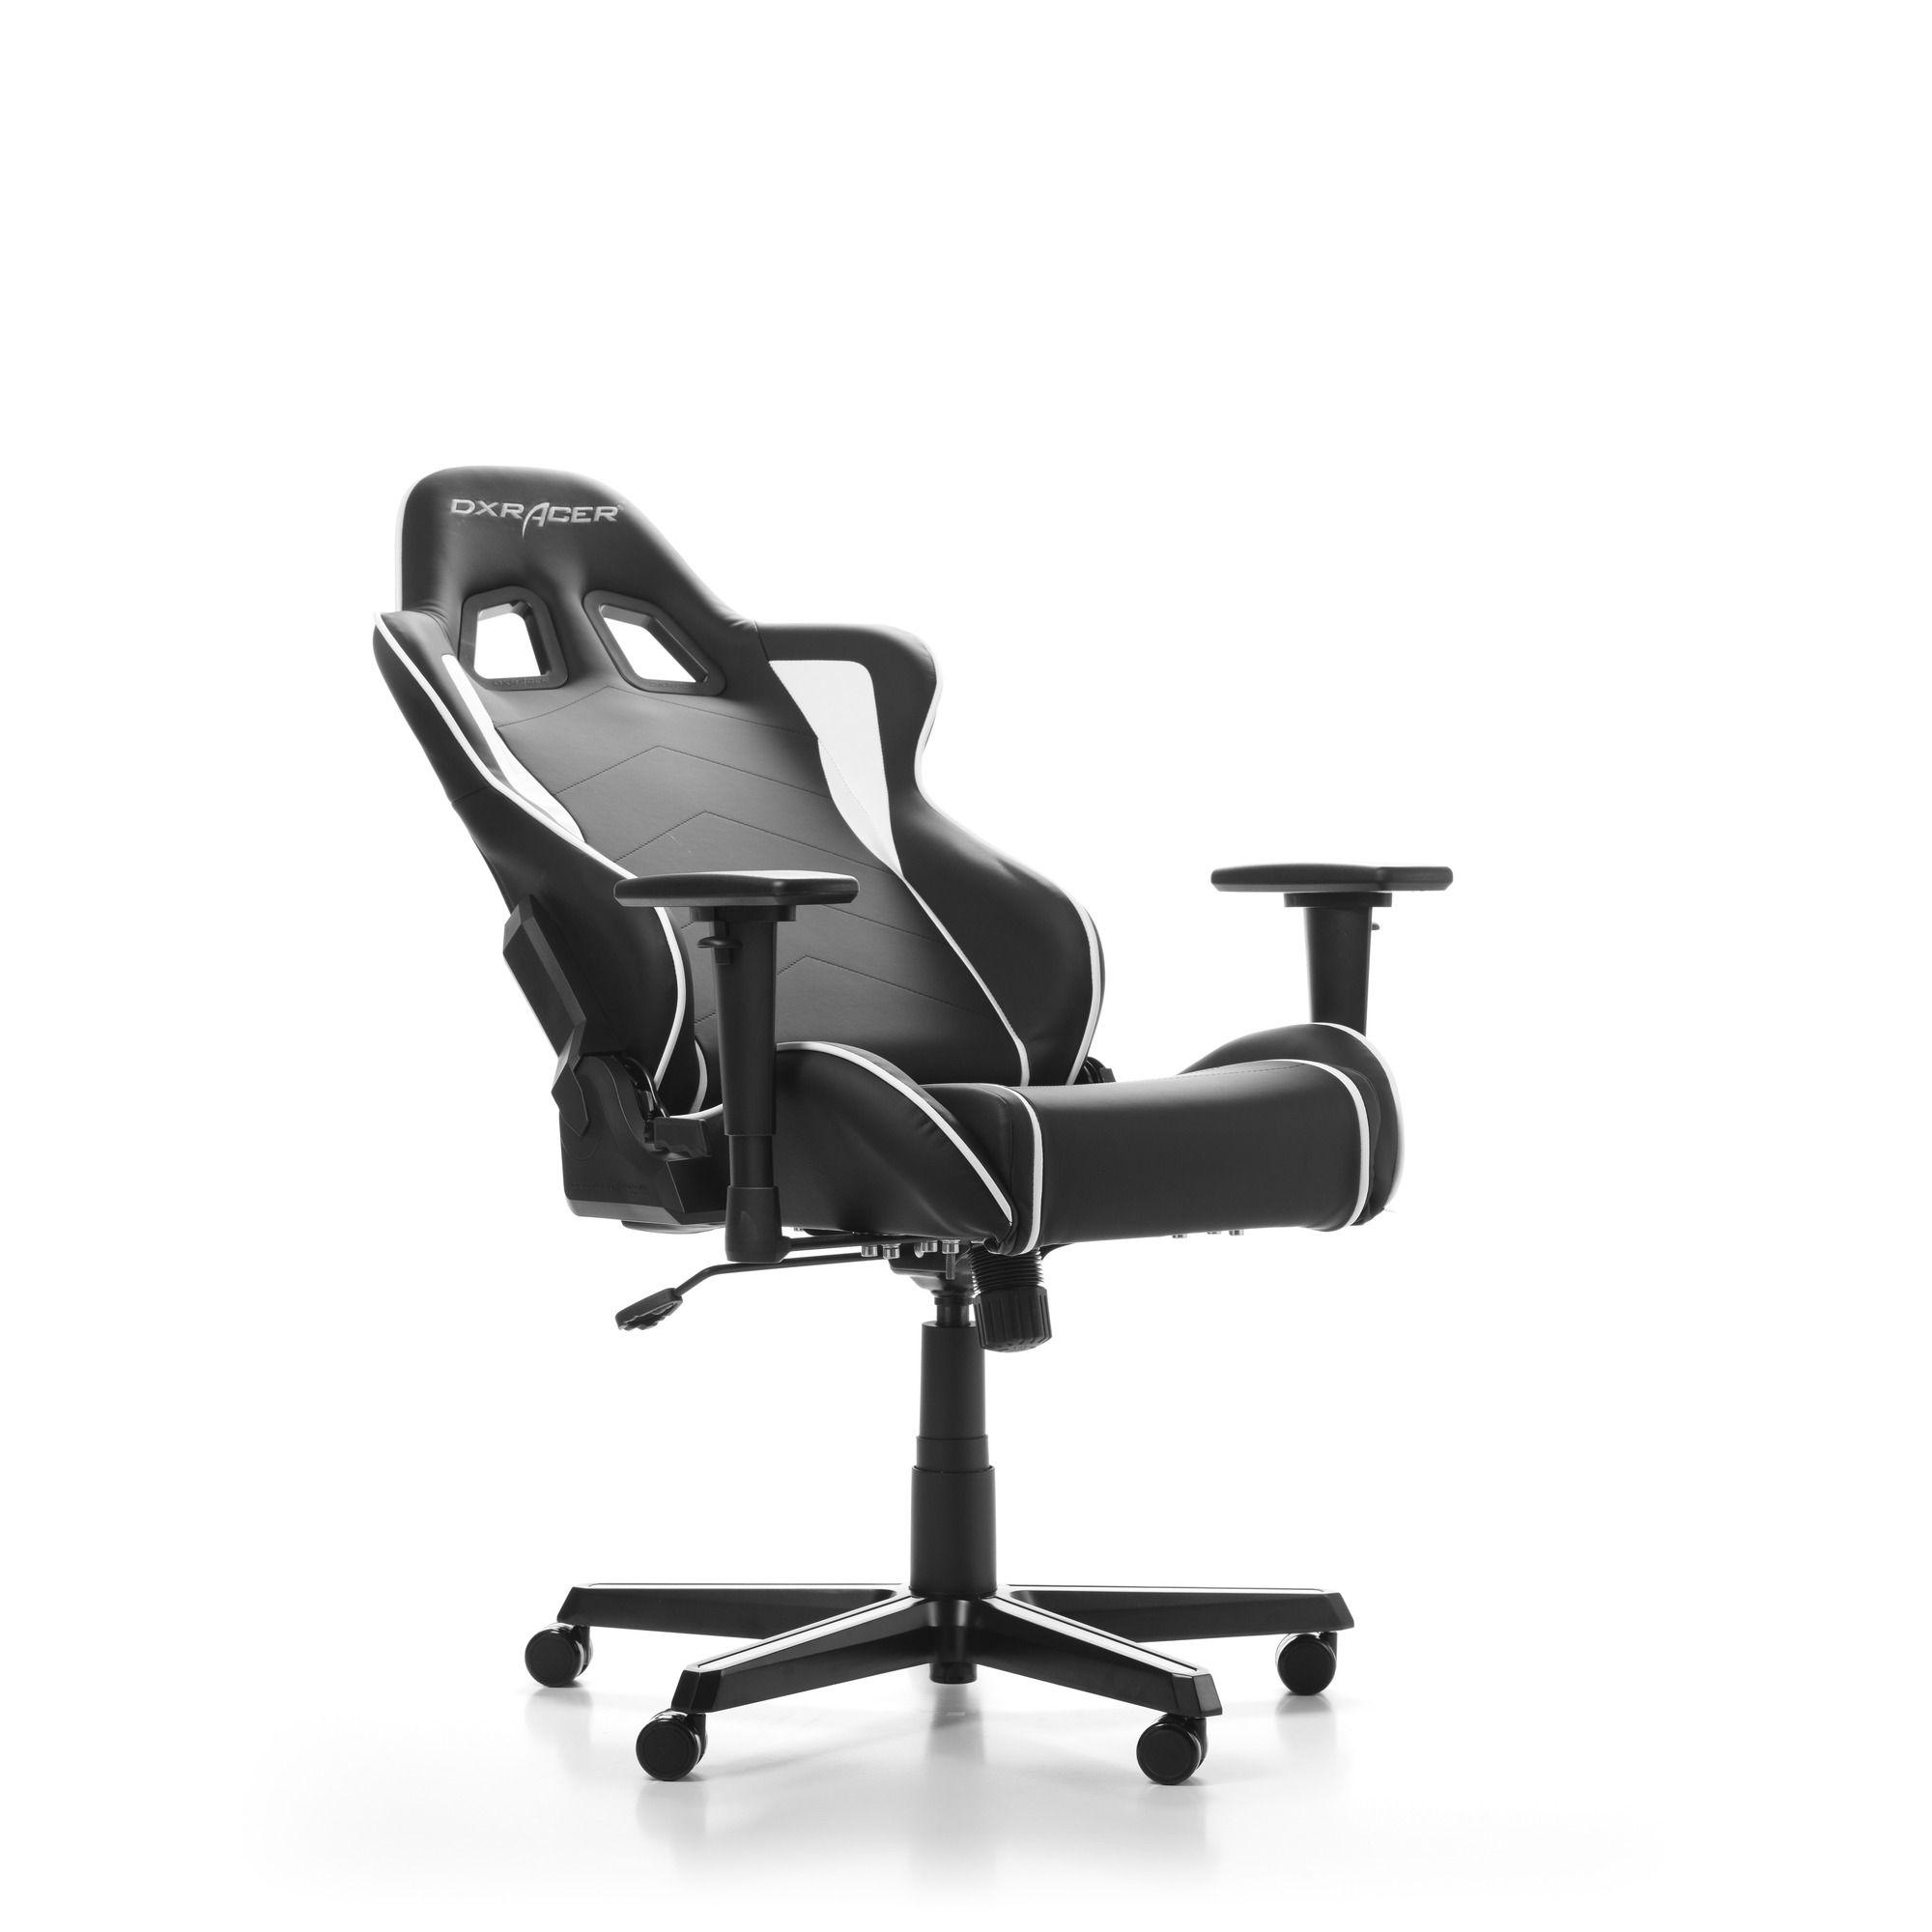 Гейминг стол DXRacer OH/FH08/NW - серия FORMULA, черен/бял - 6